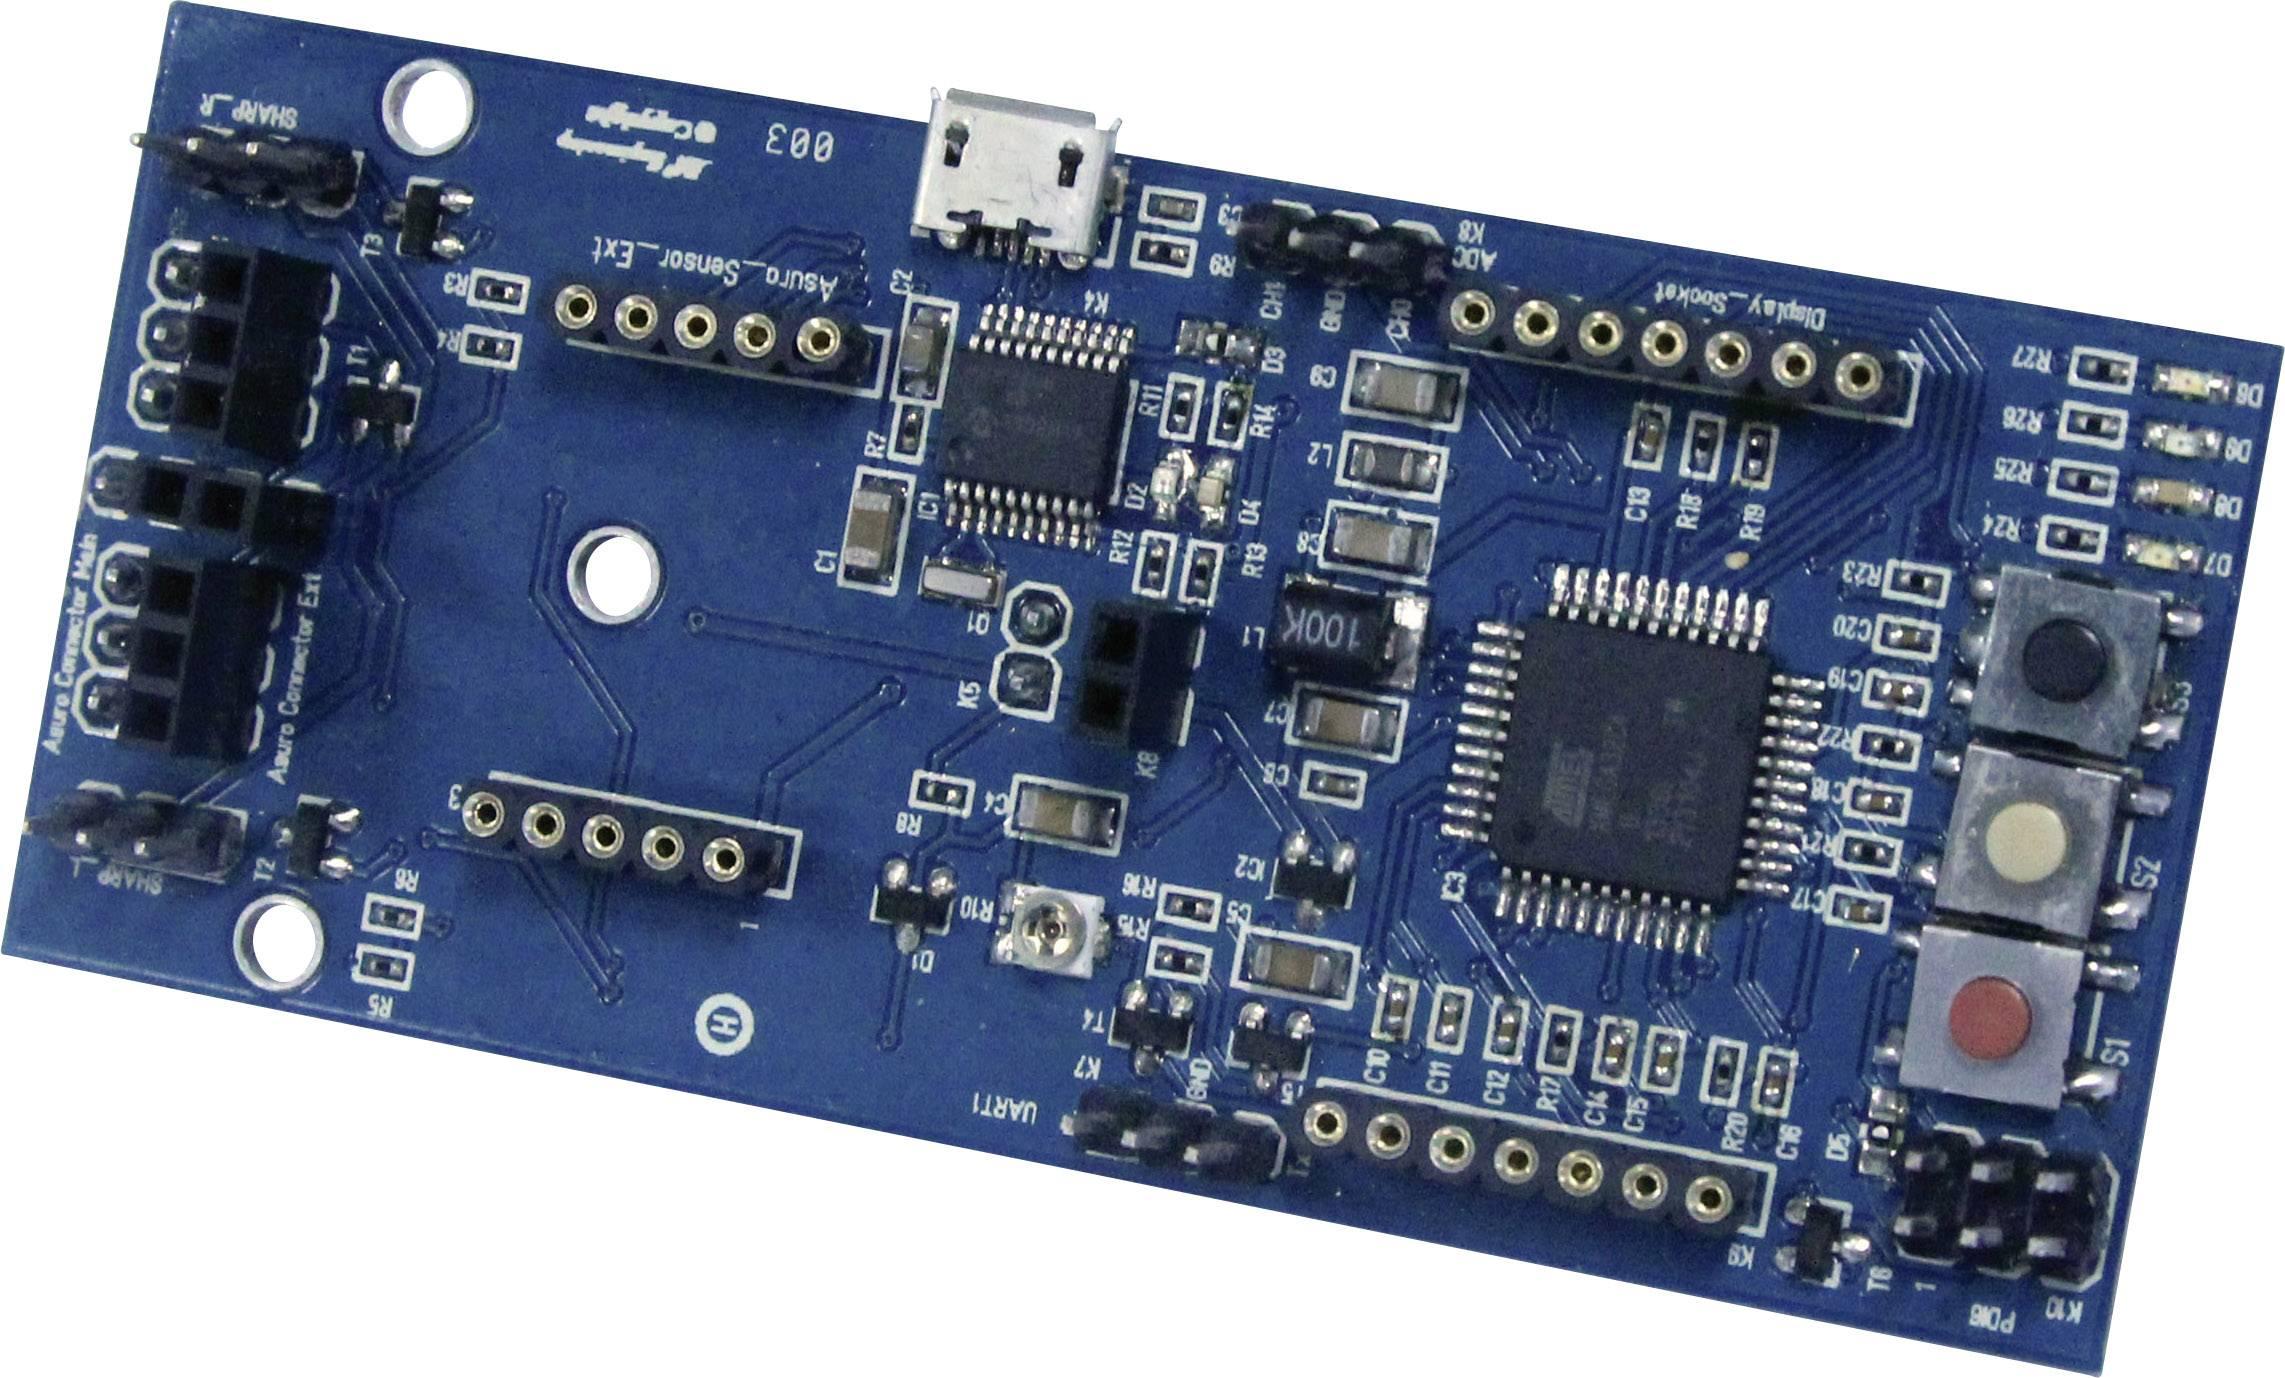 Riadiaca doska Xtend Board JM3-AXT3 pre robota Arexx Asura ARX-03